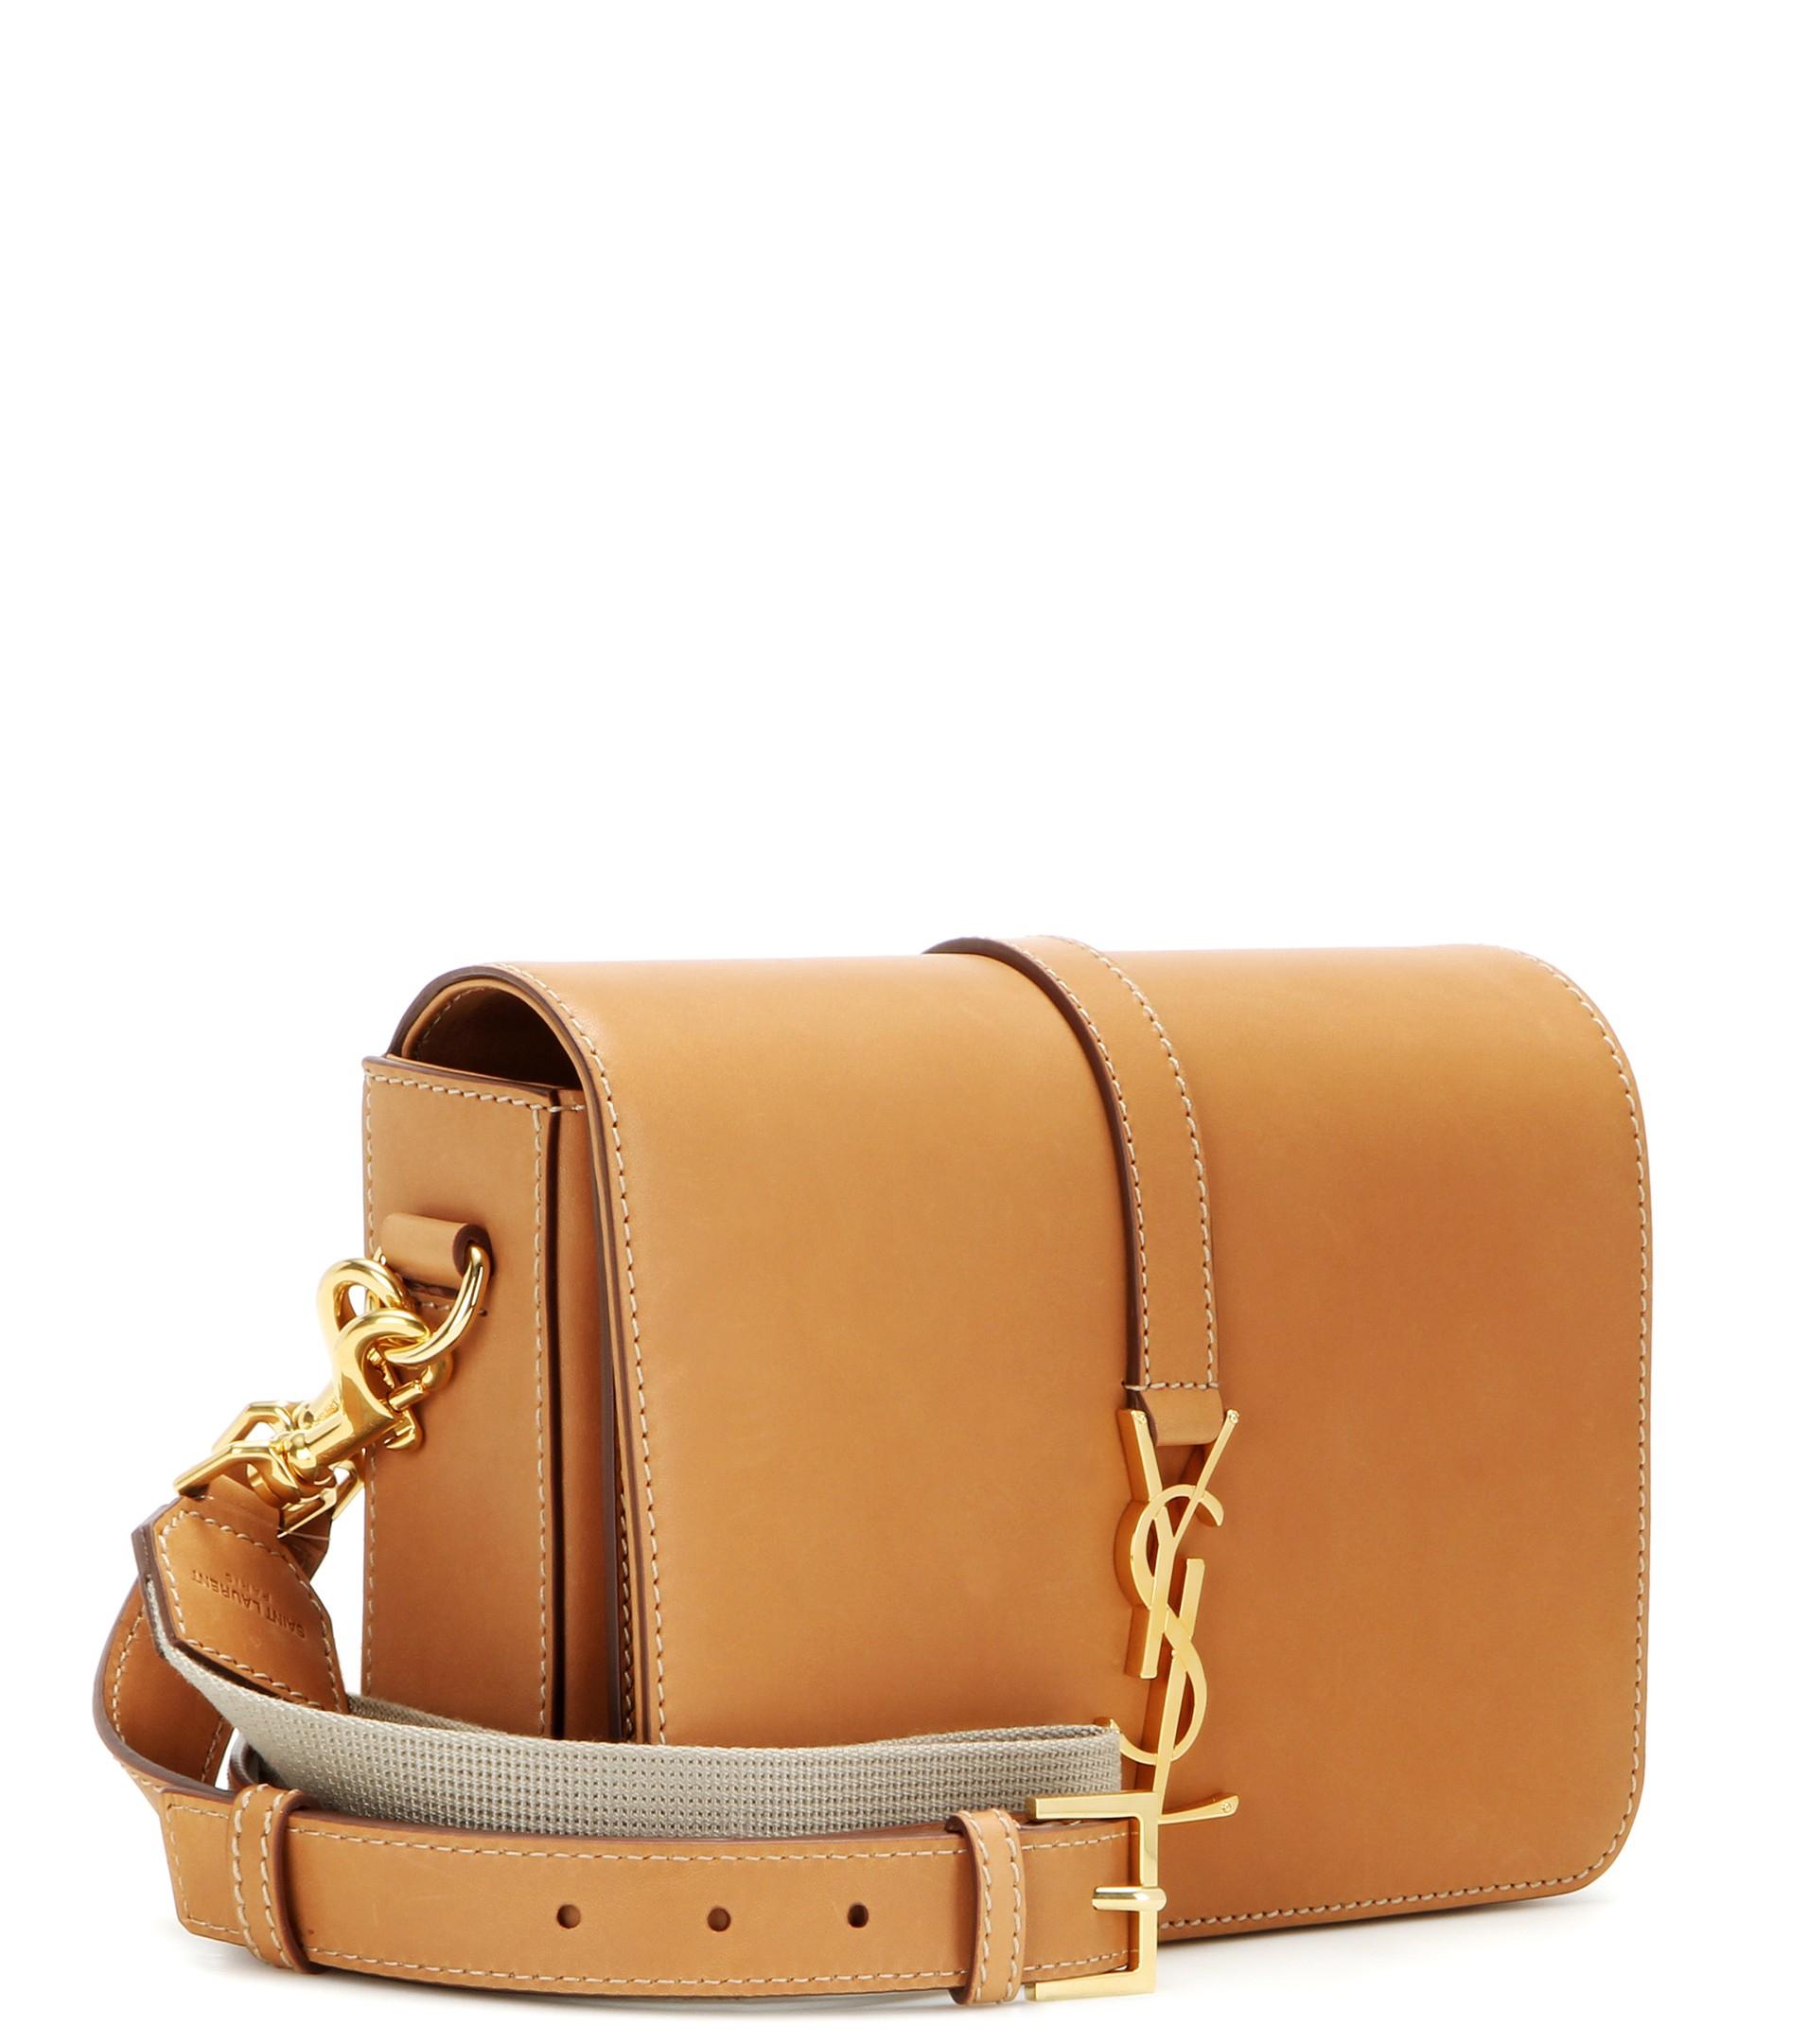 fc2feeb4ba Saint Laurent Monogram Université Medium Leather Shoulder Bag in ...